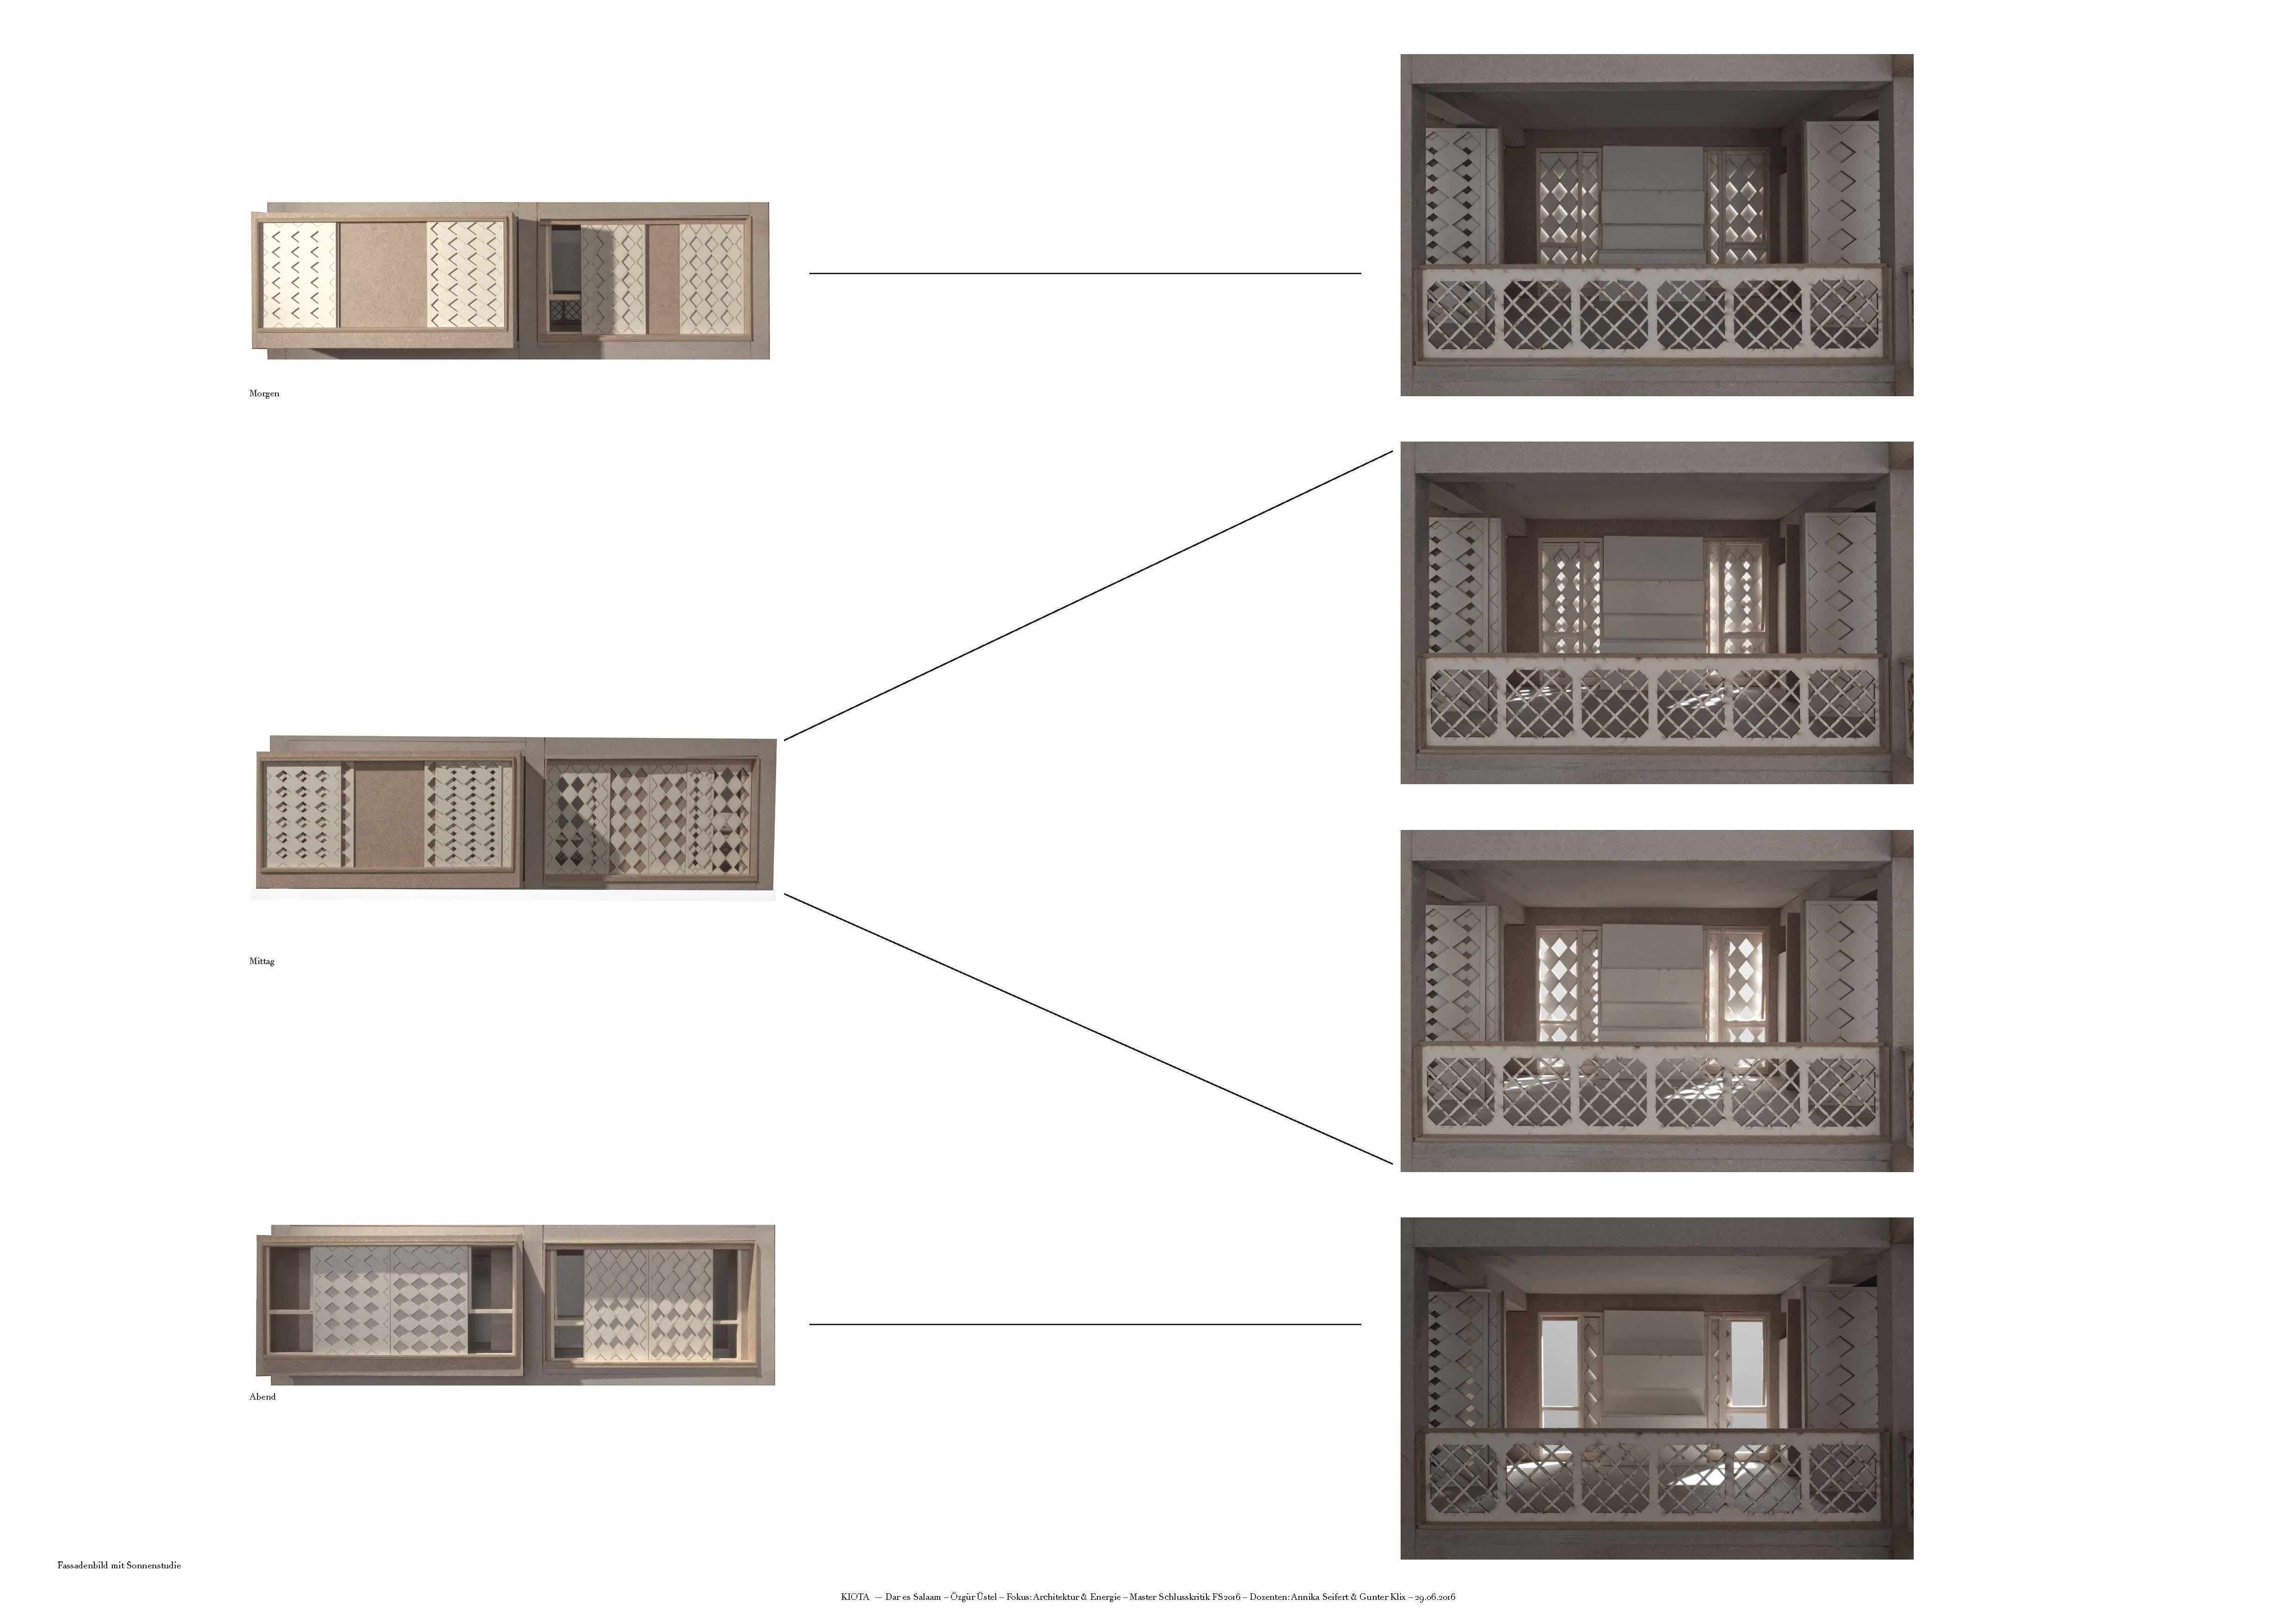 Fokus energie projekte master architektur studiengang for Master architektur